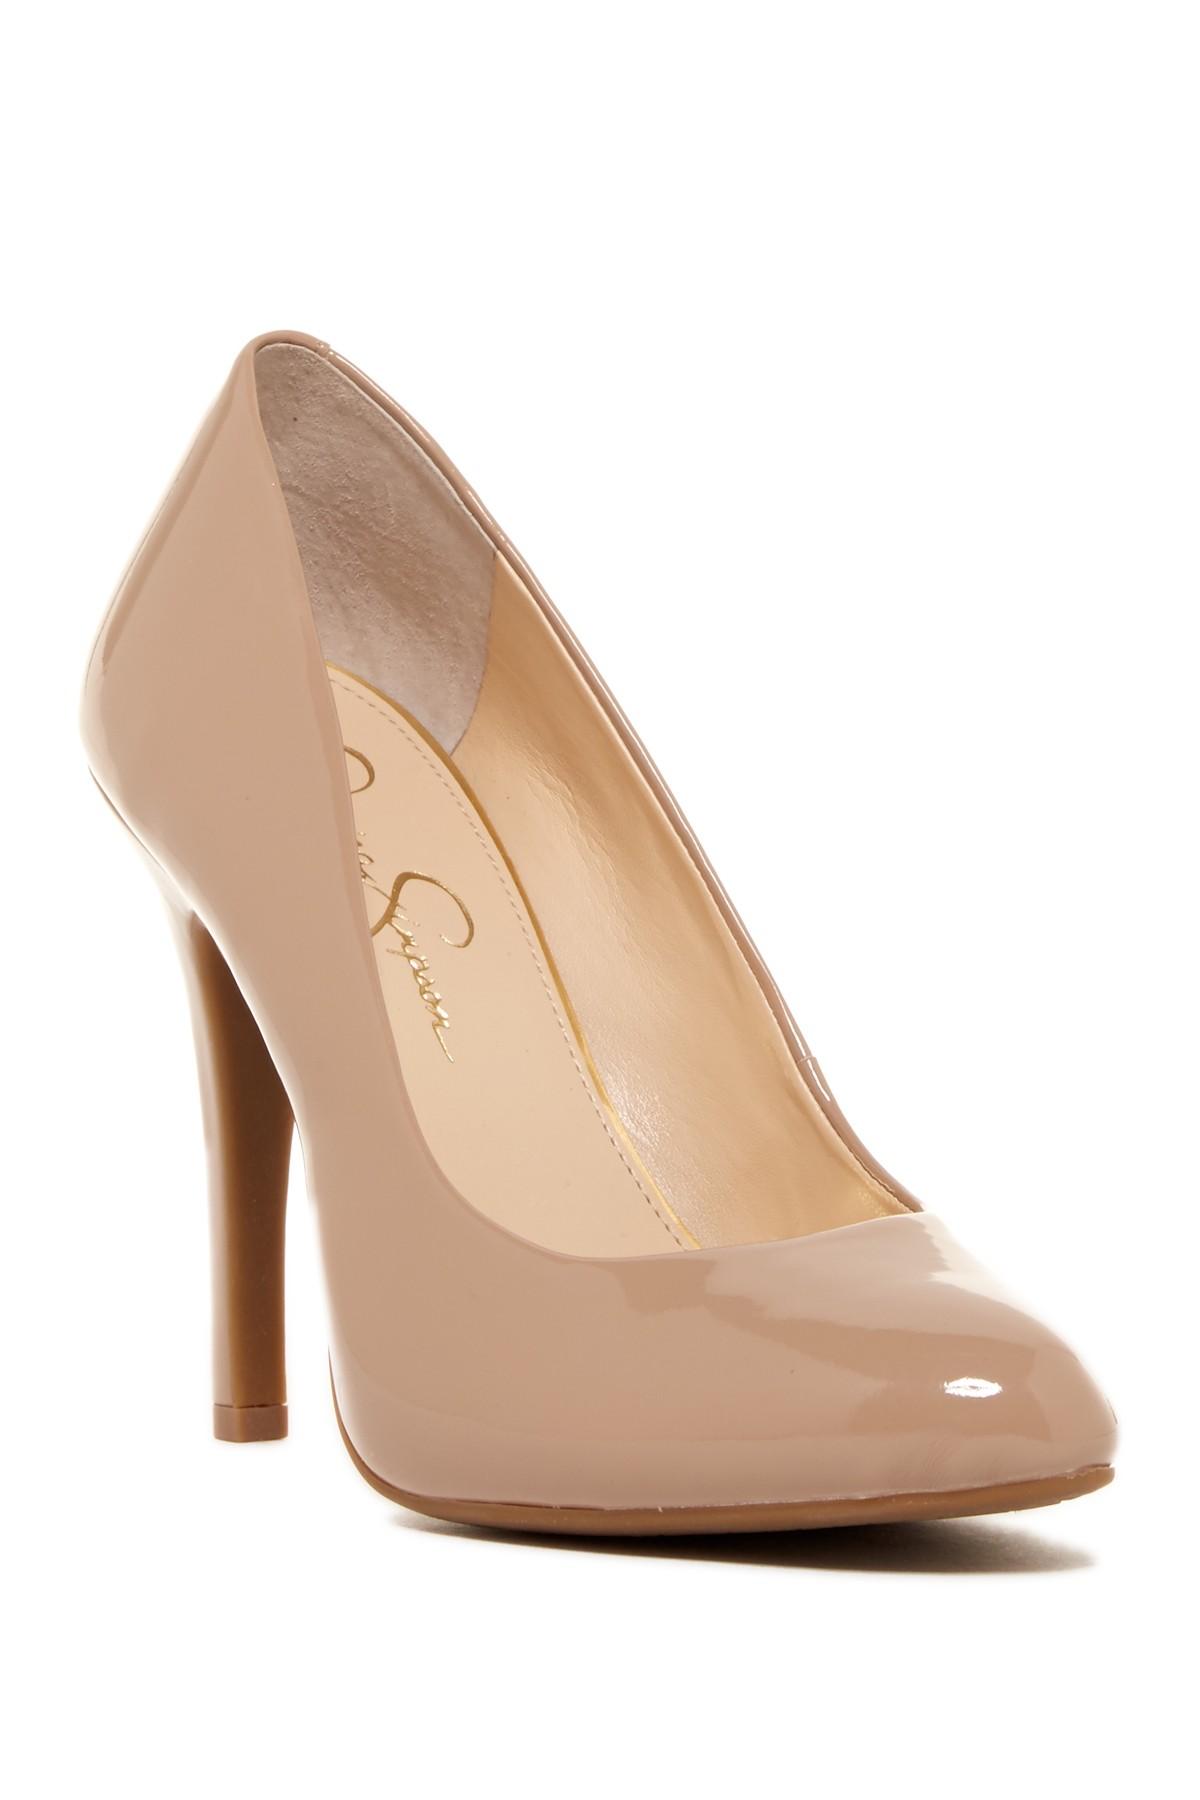 Hautelook: Up to 75% Off Women's Shoes - Jessica Simpson Pumps $18, Espirit Sneakers $15, & More